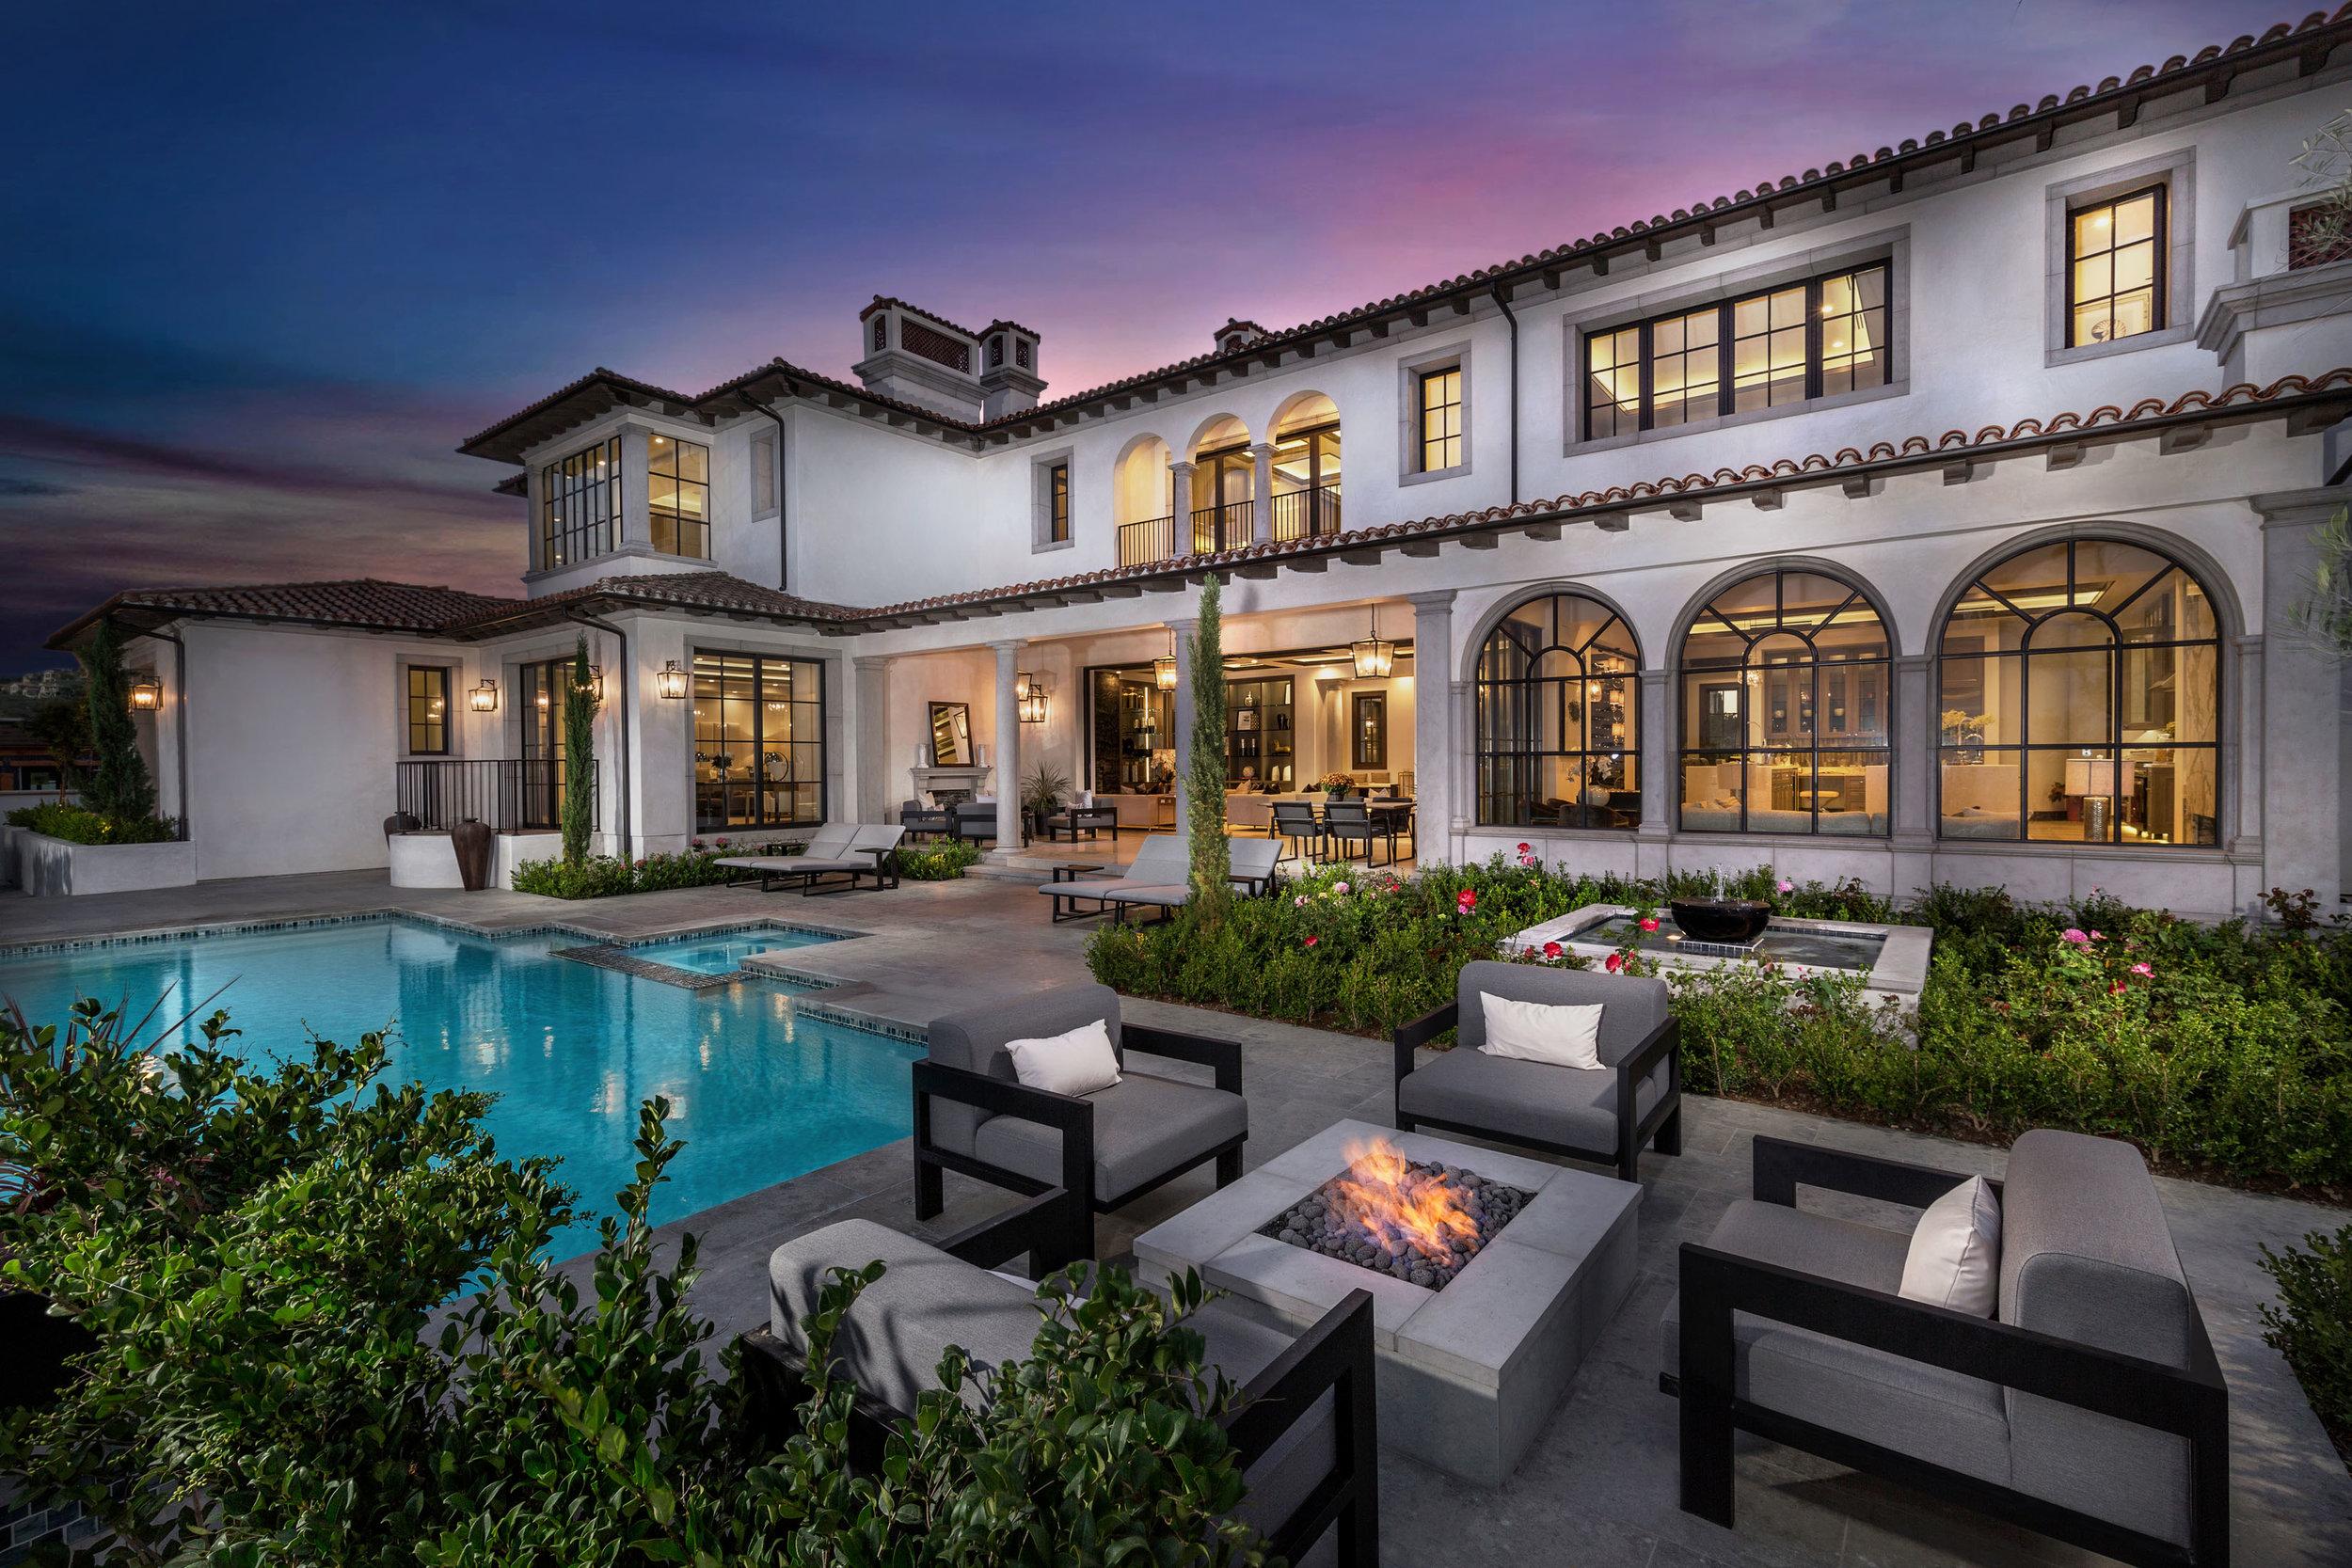 Crystal Cove - Northern Italian Villa Pool by Oatman Architects